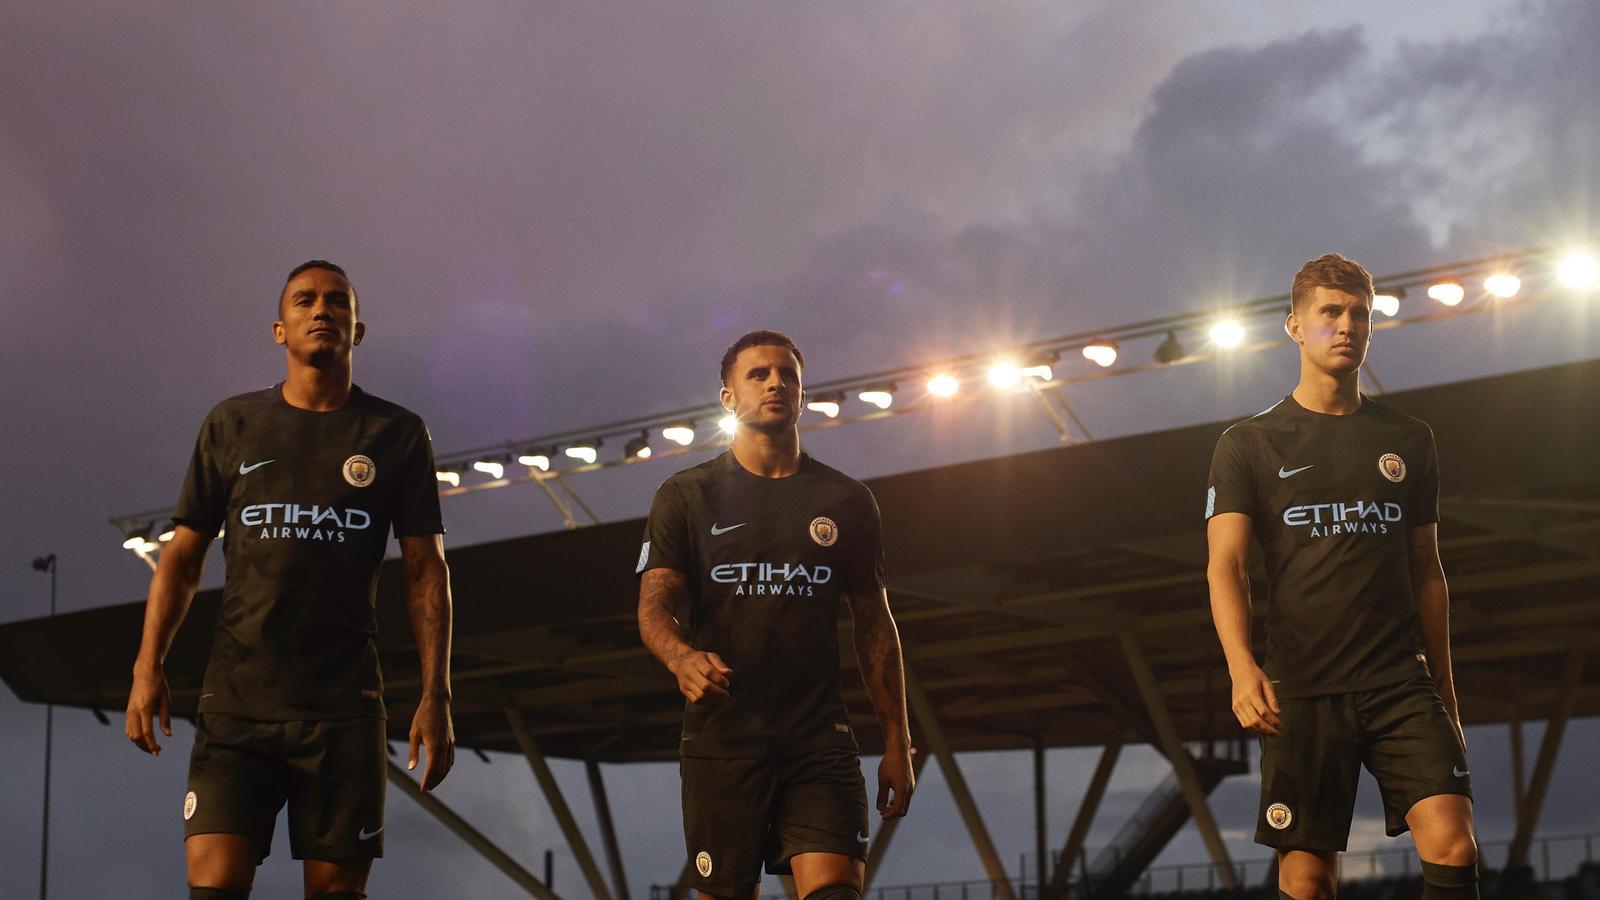 maillot-football-manchester-city-2017-2018-ligue-des-champions-septembre-3